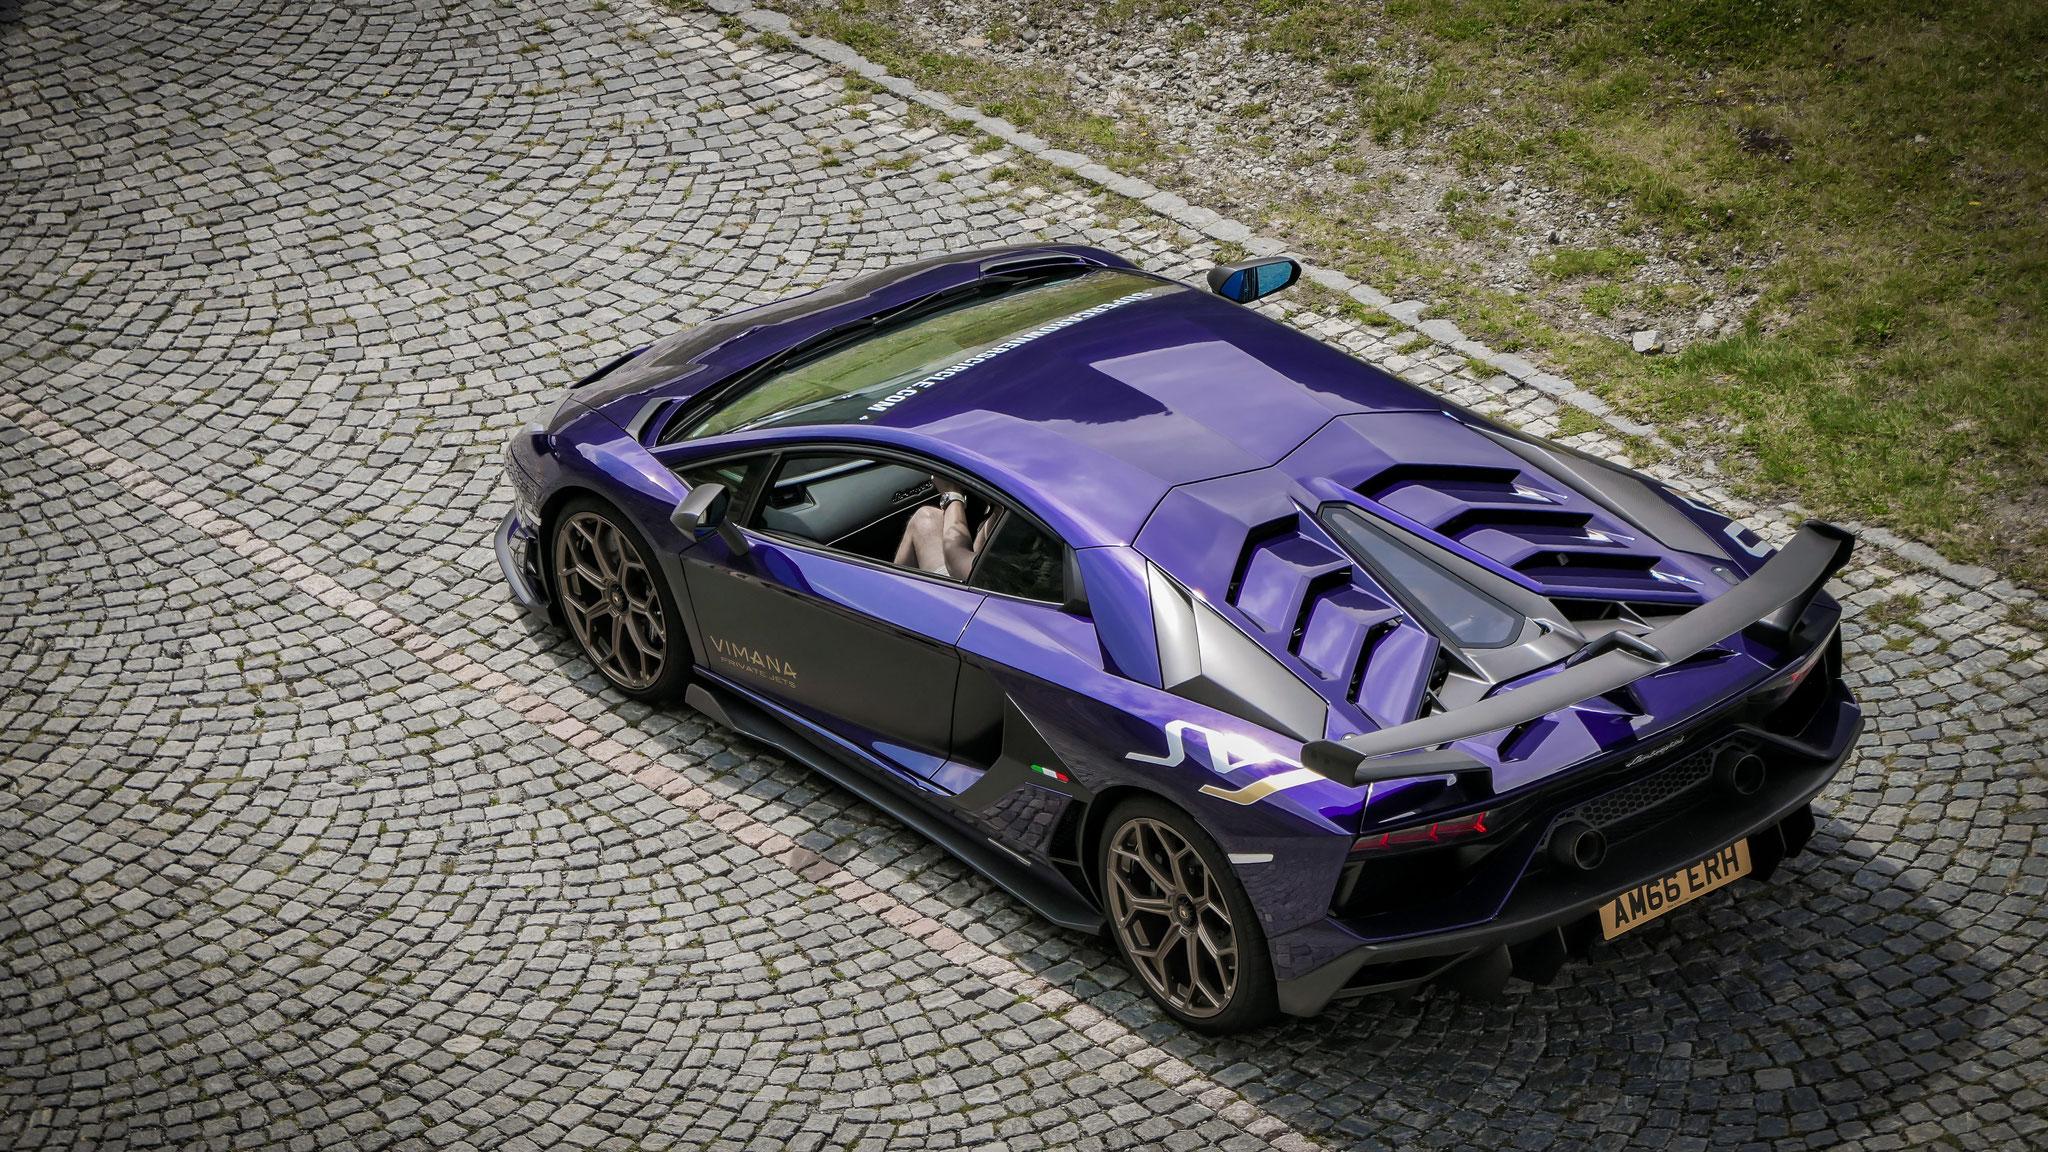 Lamborghini Aventador LP 770 SVJ - AM66-ERH (GB)